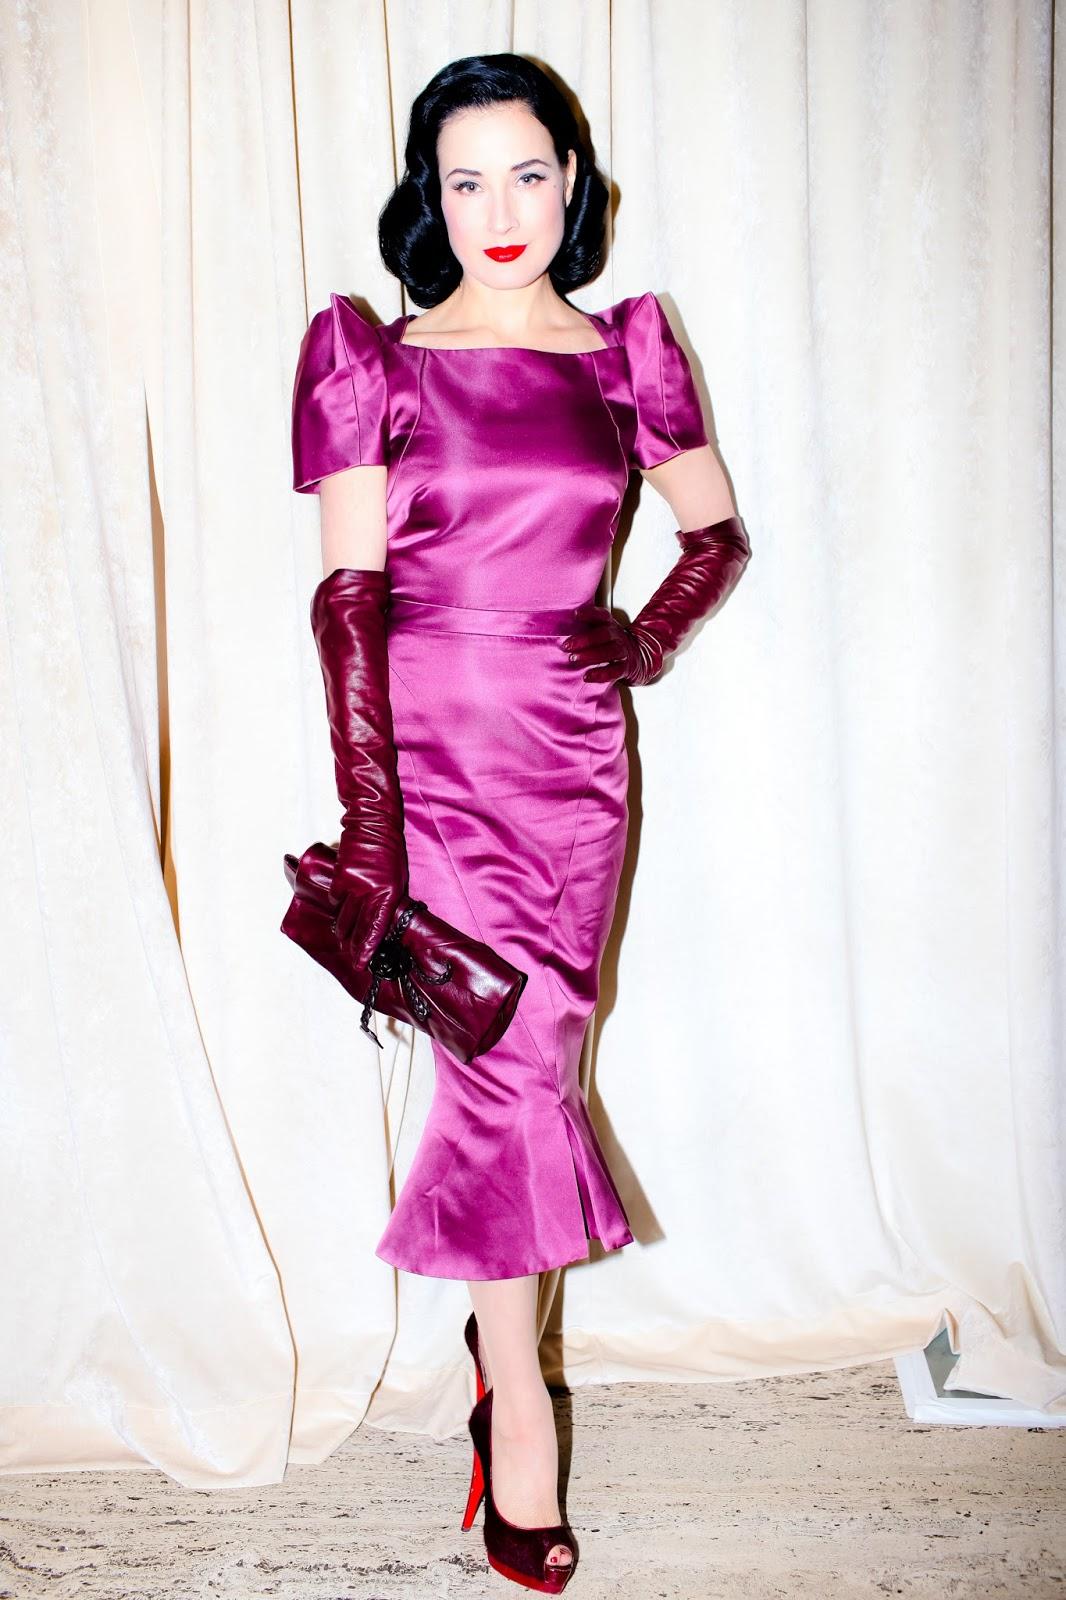 Ladies In Satin Blouses Dita Von Teese Purple Satin Dress